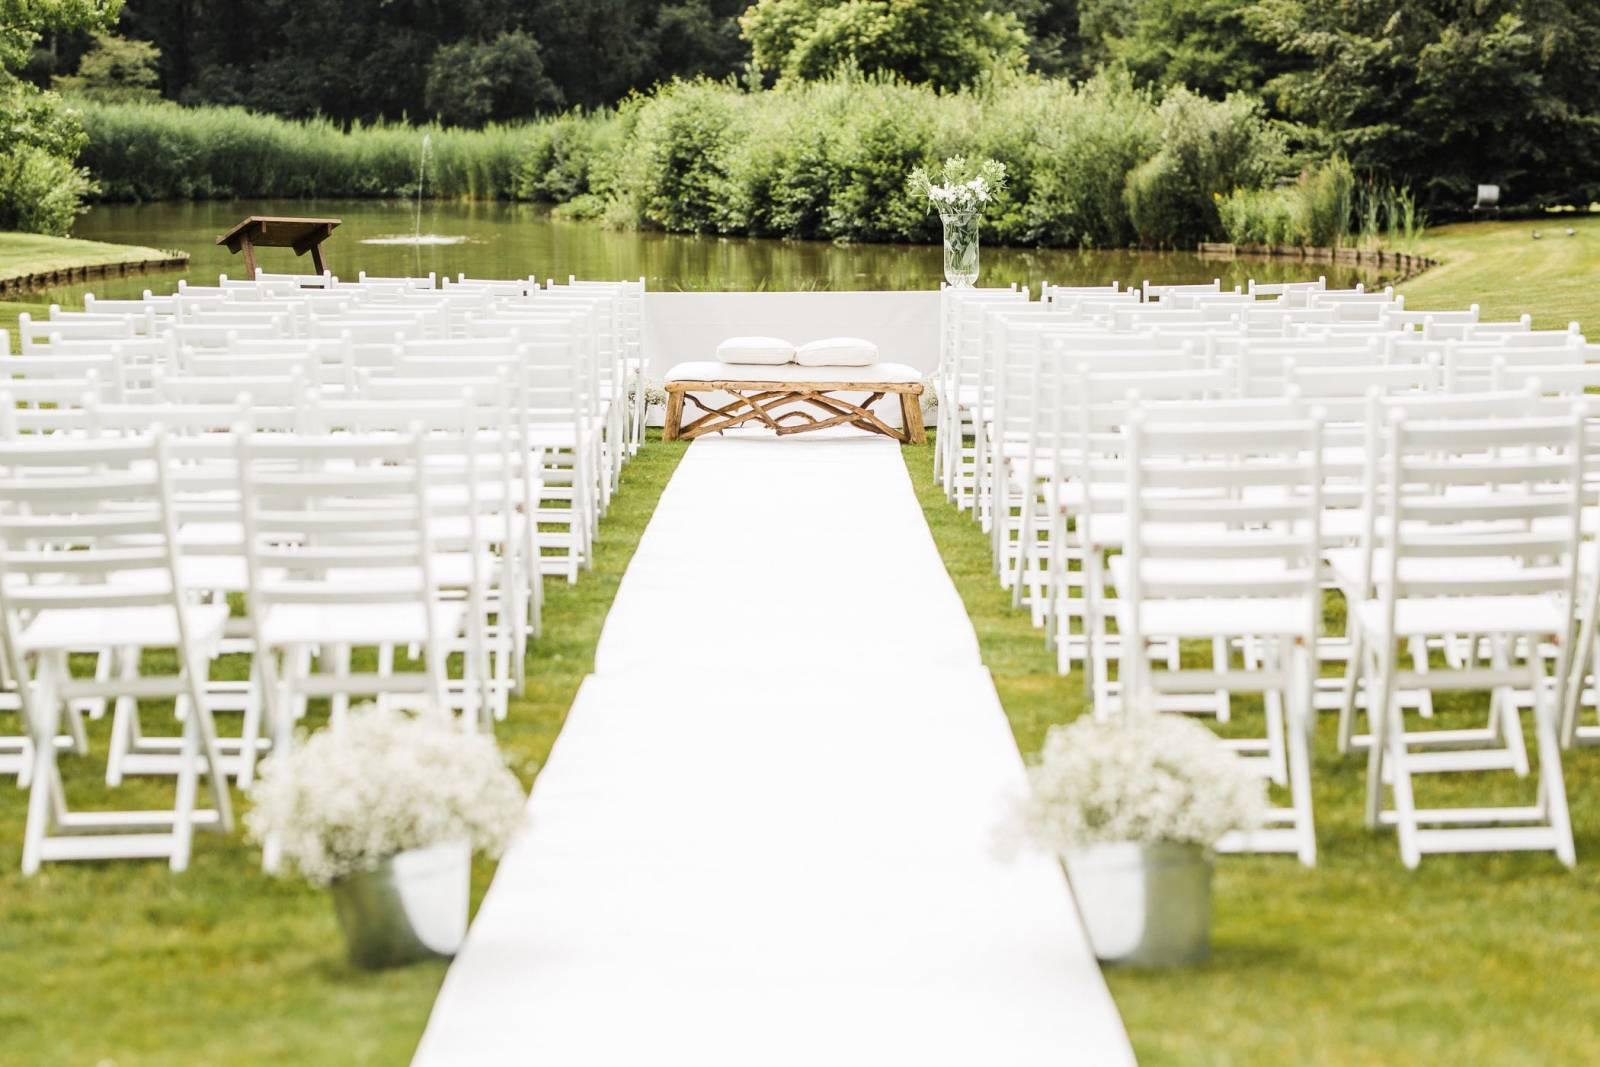 De Barrier - Feestzaal -  House of Weddings - 22